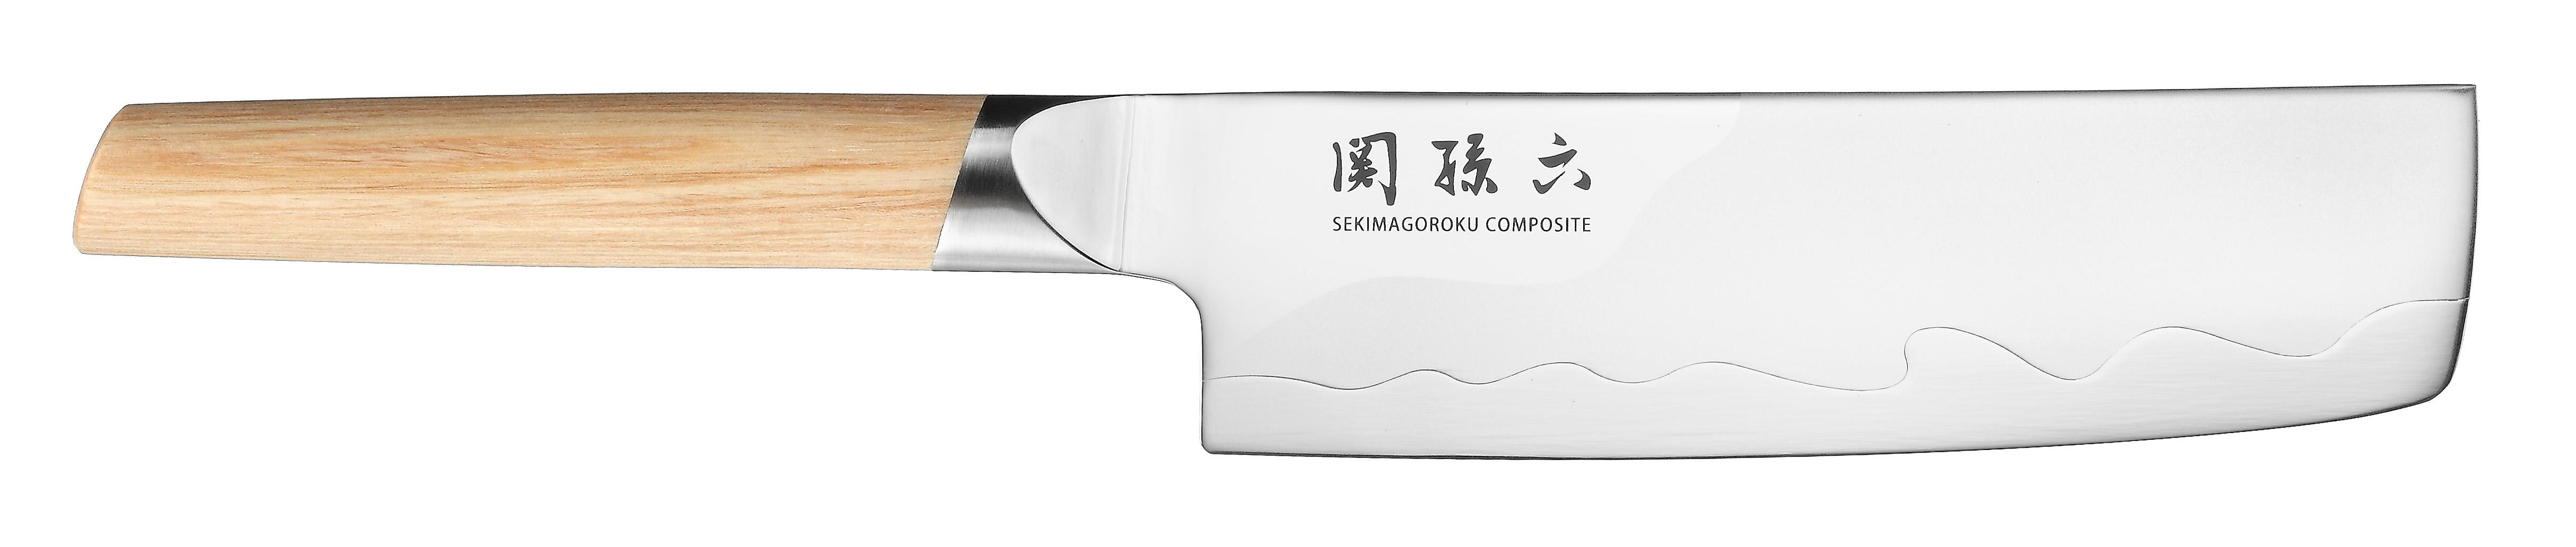 KAI SEKI MAGOROKU COMPOSITE MGC-0428